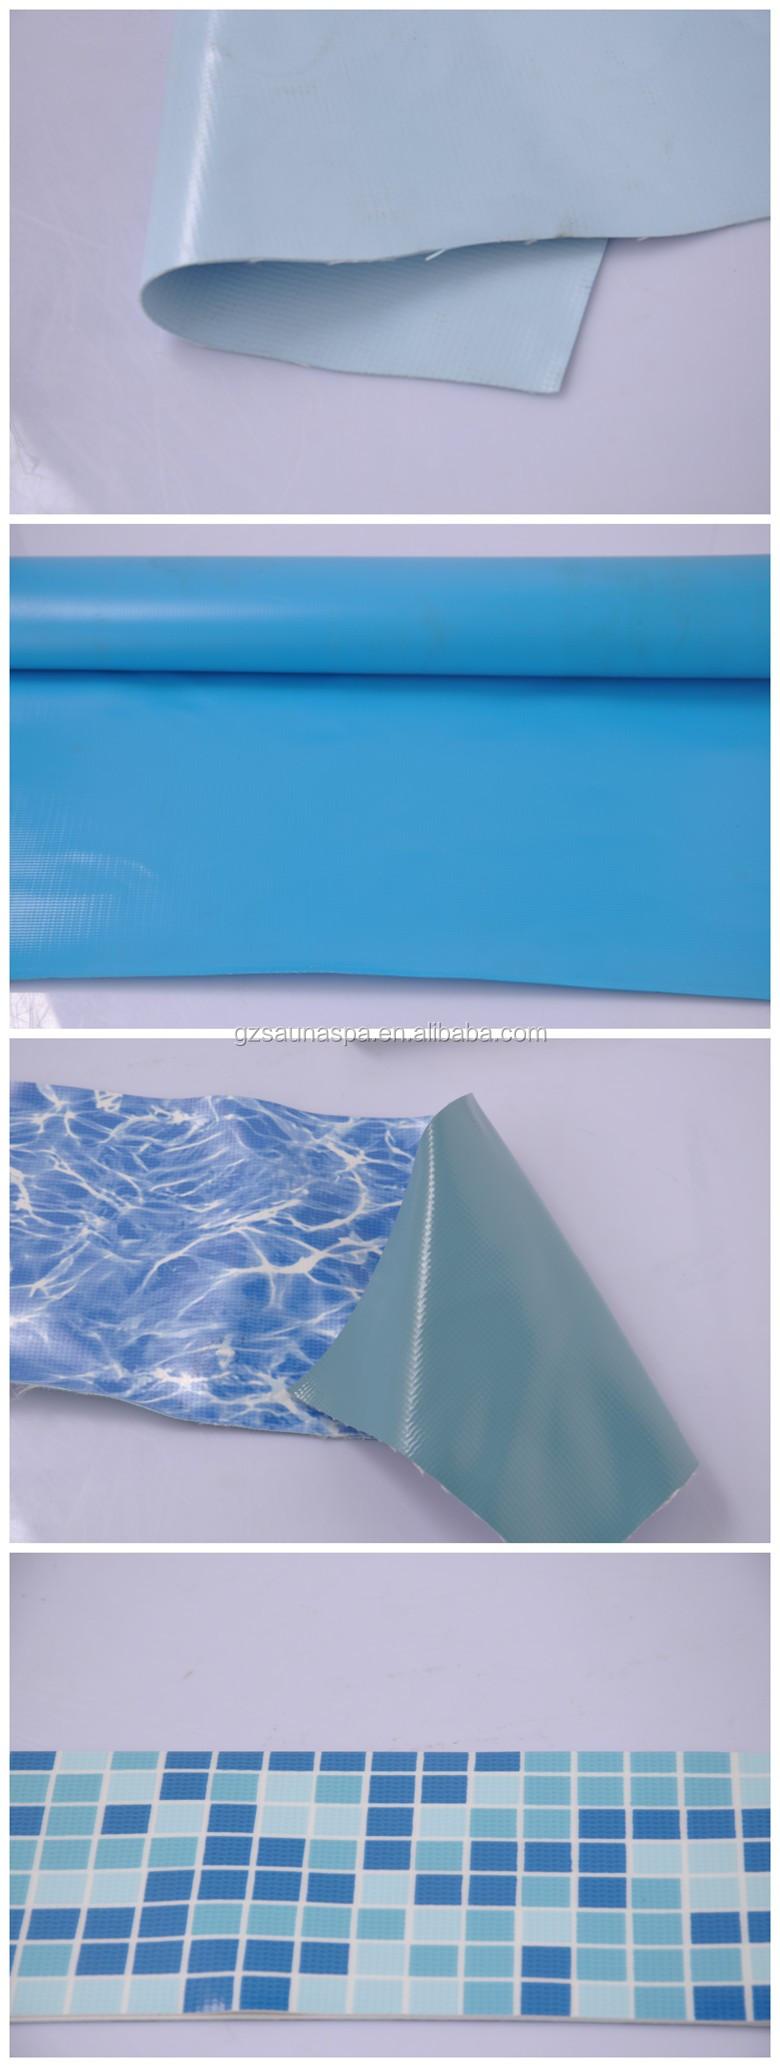 2016 New Wholesale Factory Made Pvc Plastic Swimming Pool Liner Material Buy Swimming Pool